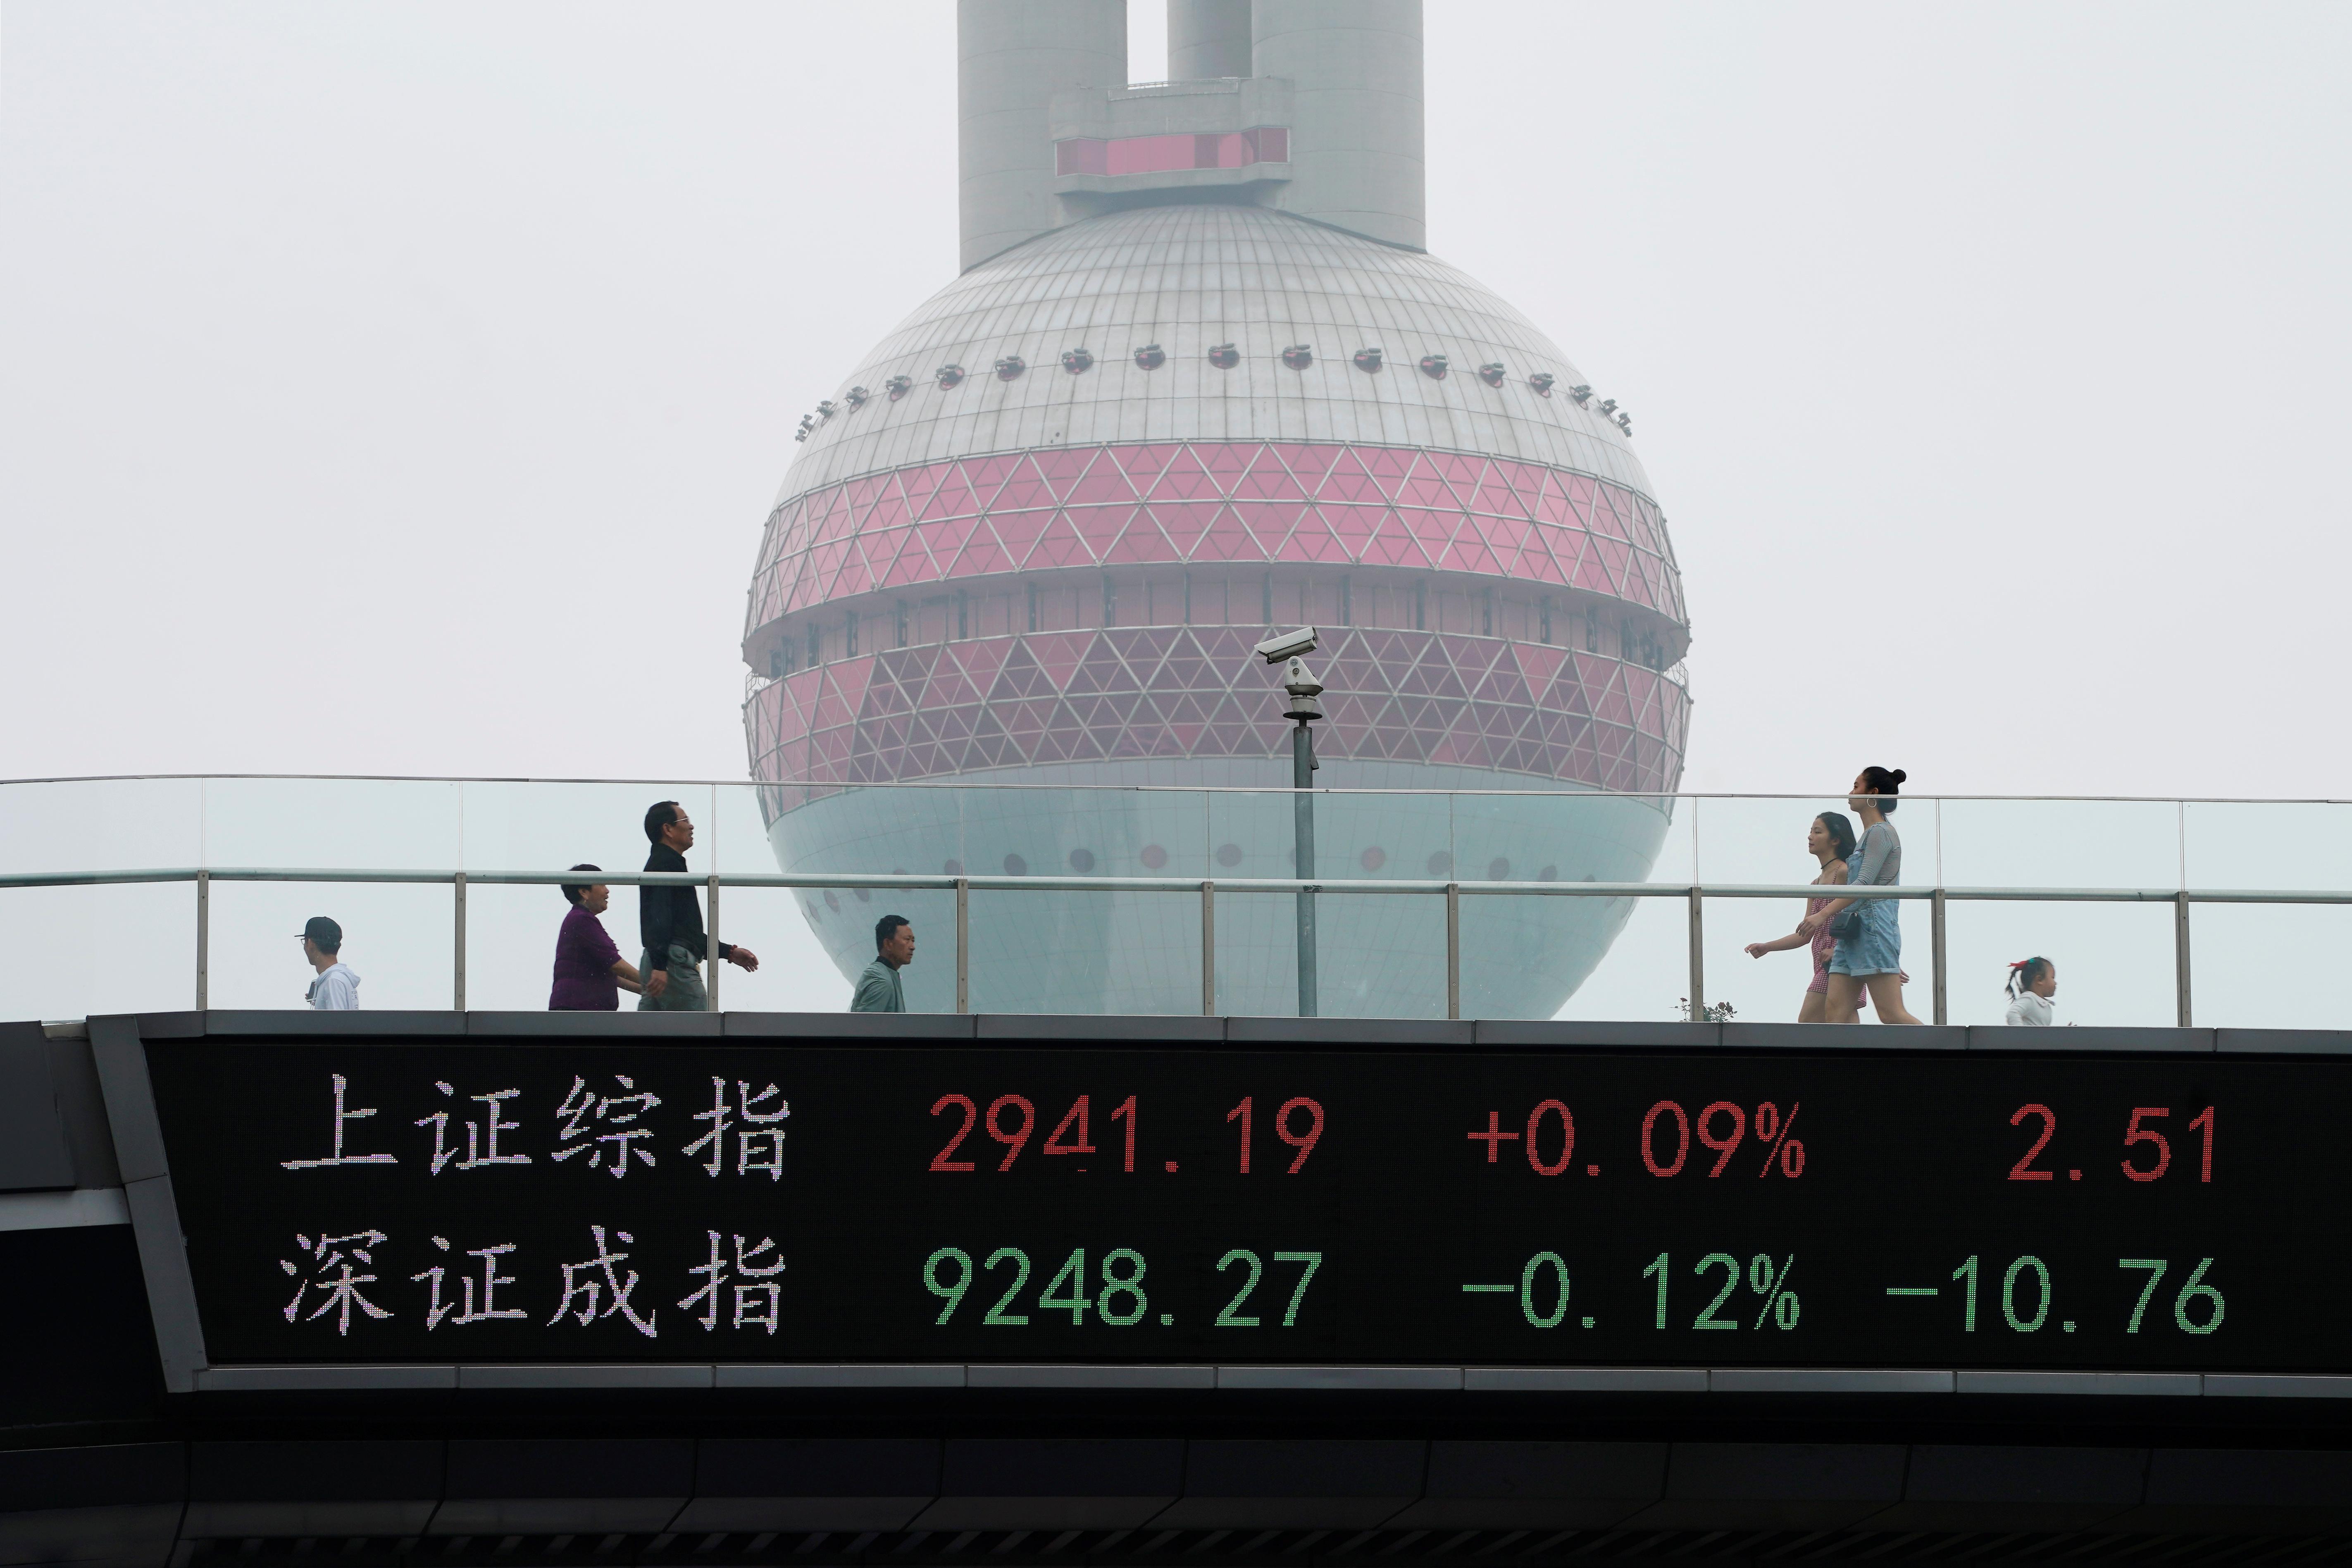 Fear and fervor propel Shanghai's tech board amid trade, Huawei tensions